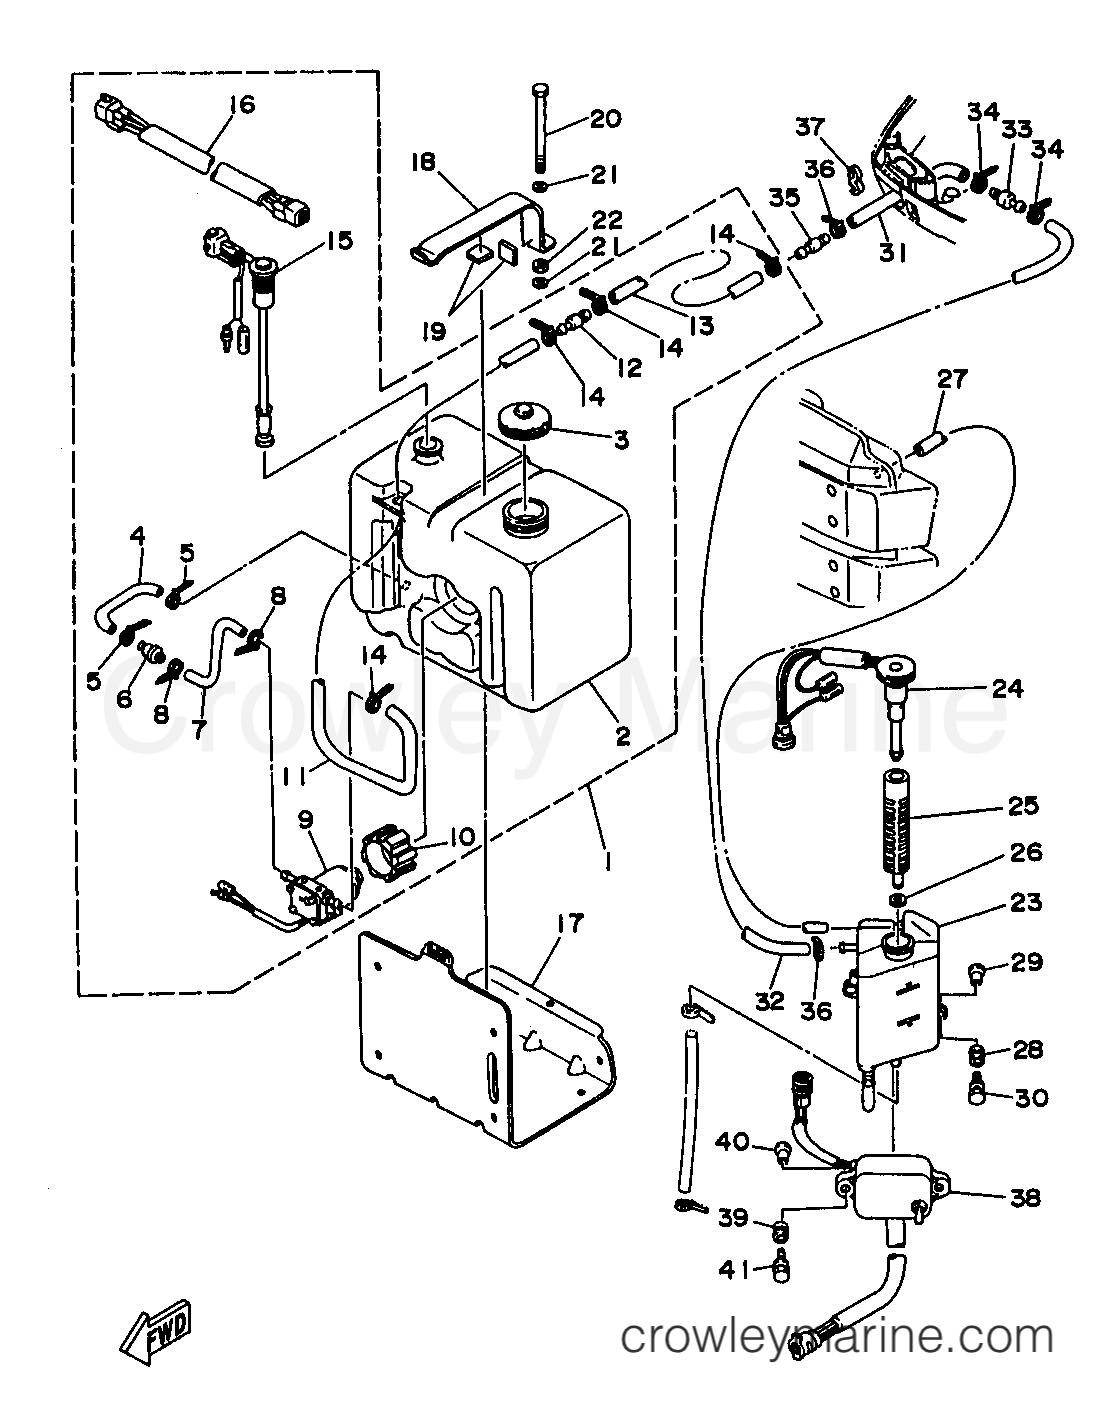 Bndsbfnm on Yamaha Waverunner Wiring Diagram